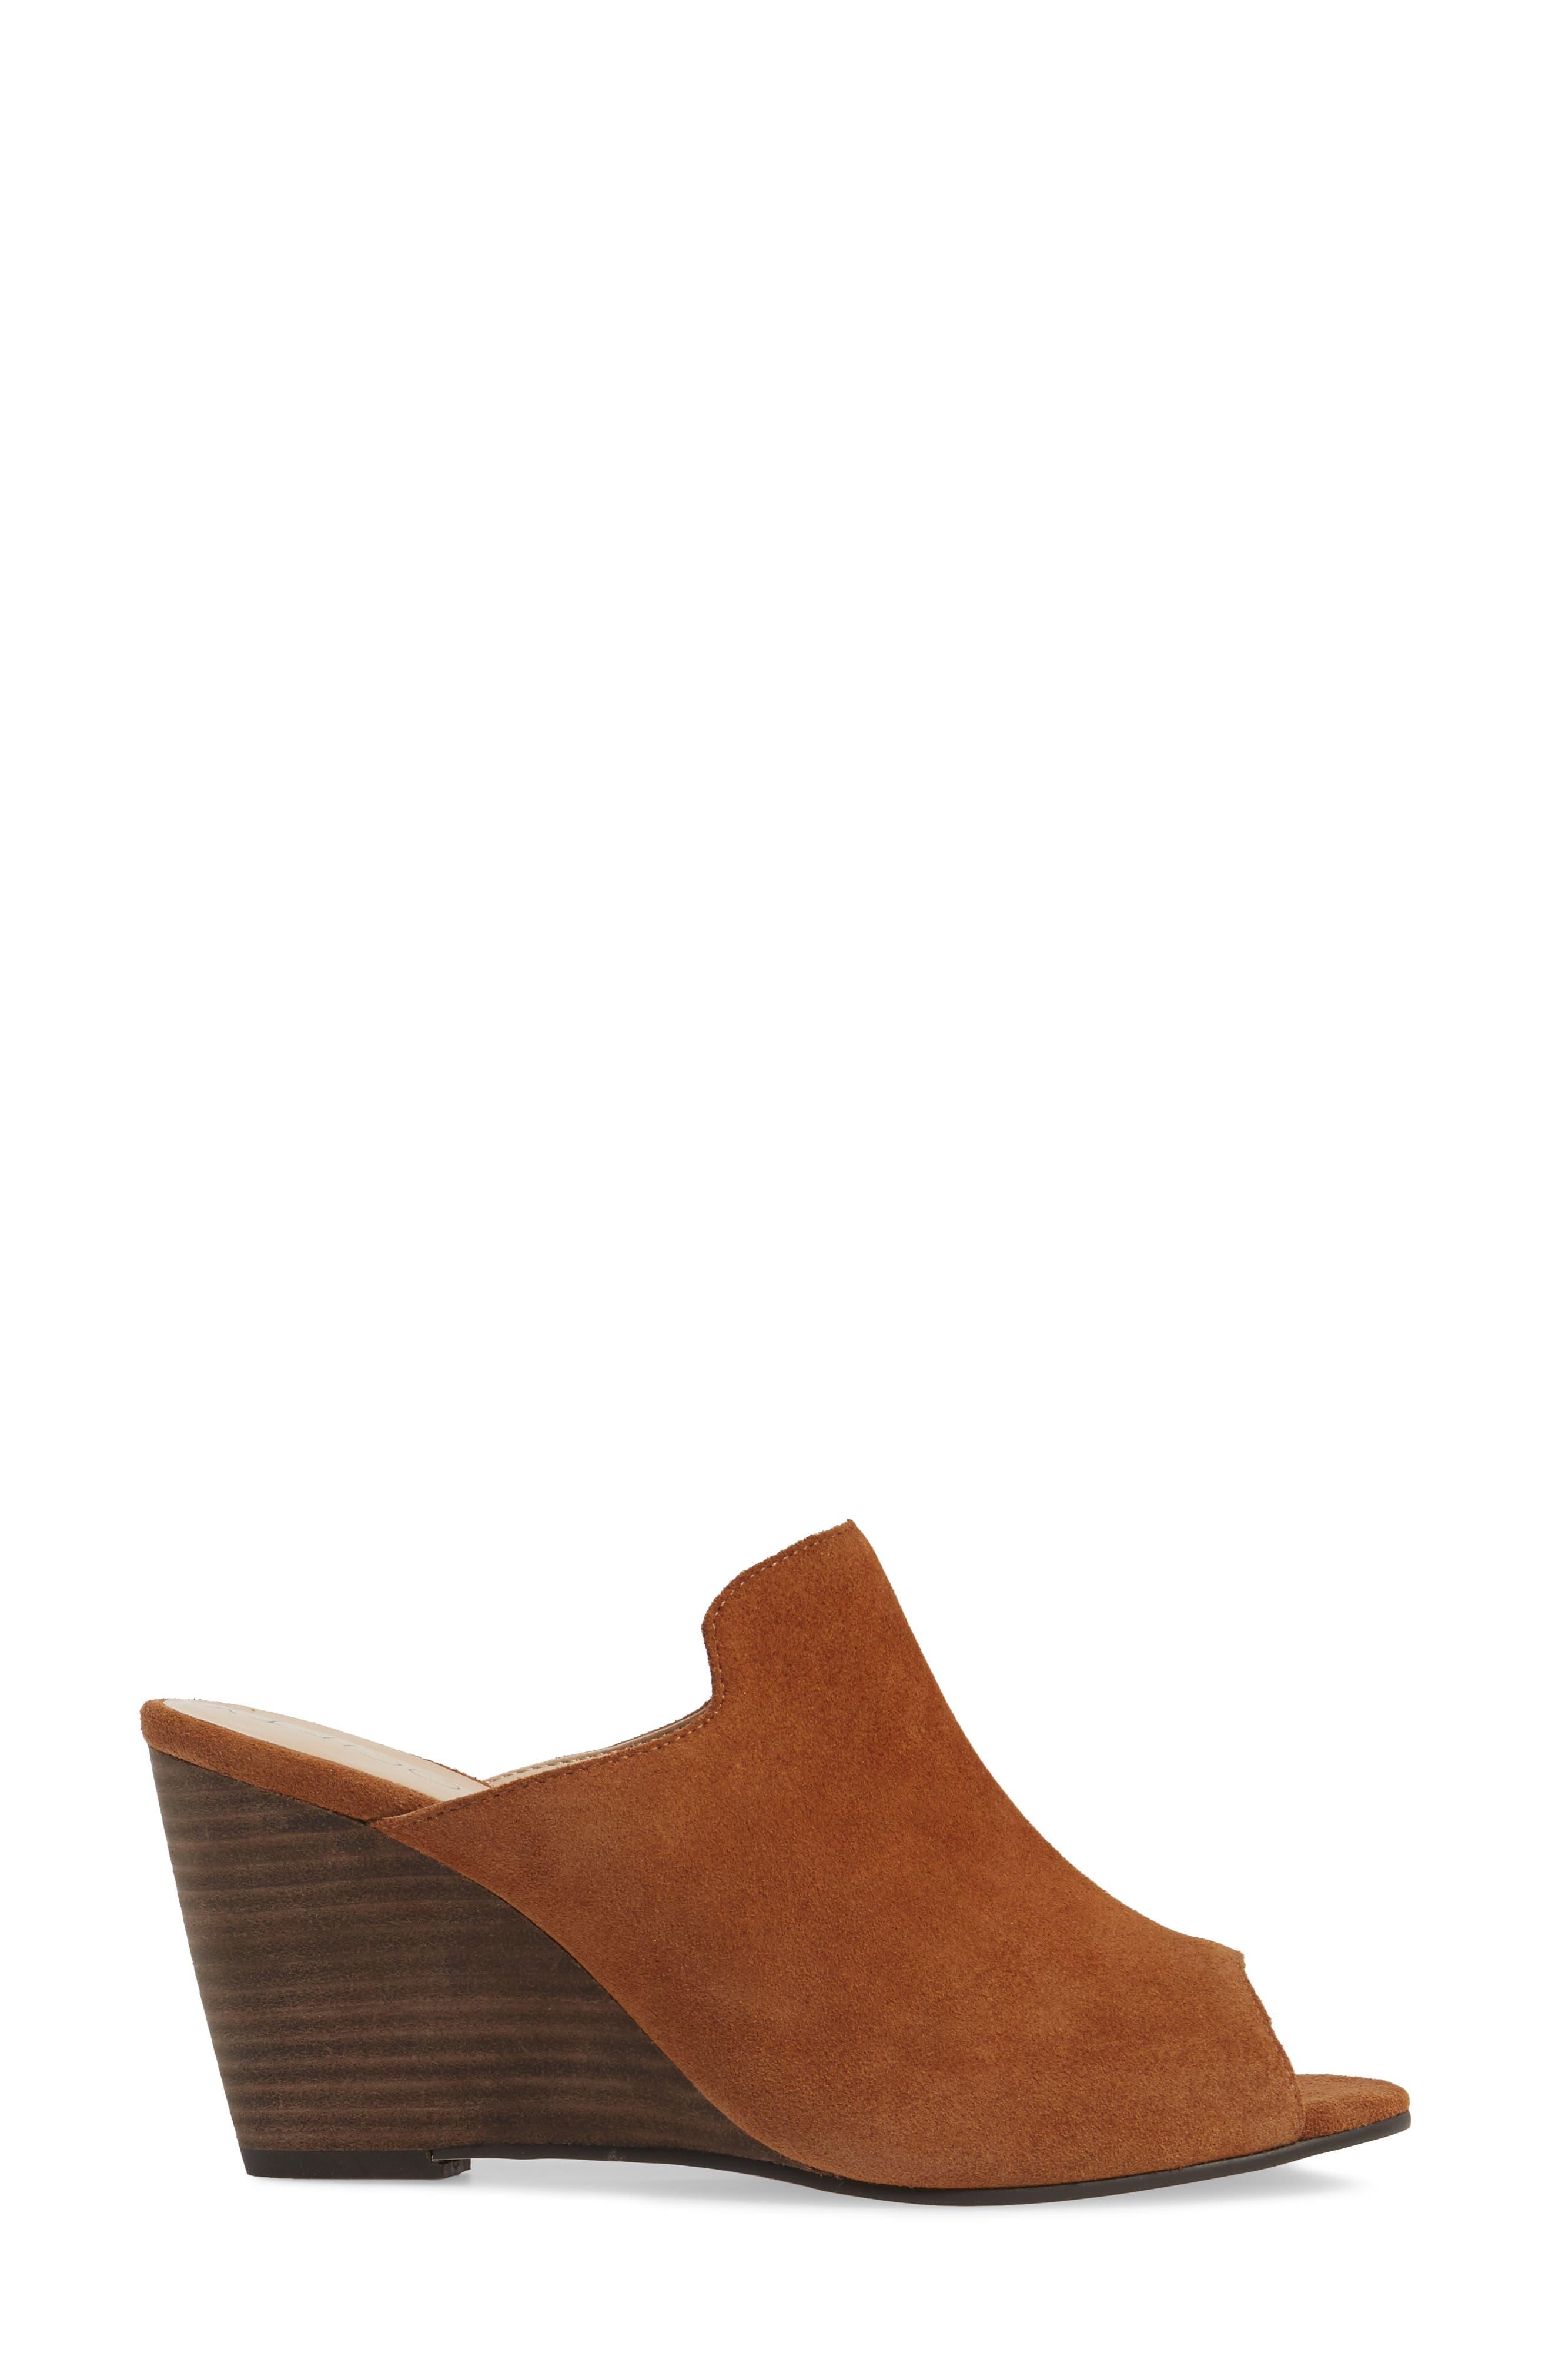 Drew Open-Toe Wedge Mule,                             Alternate thumbnail 3, color,                             Cognac Suede